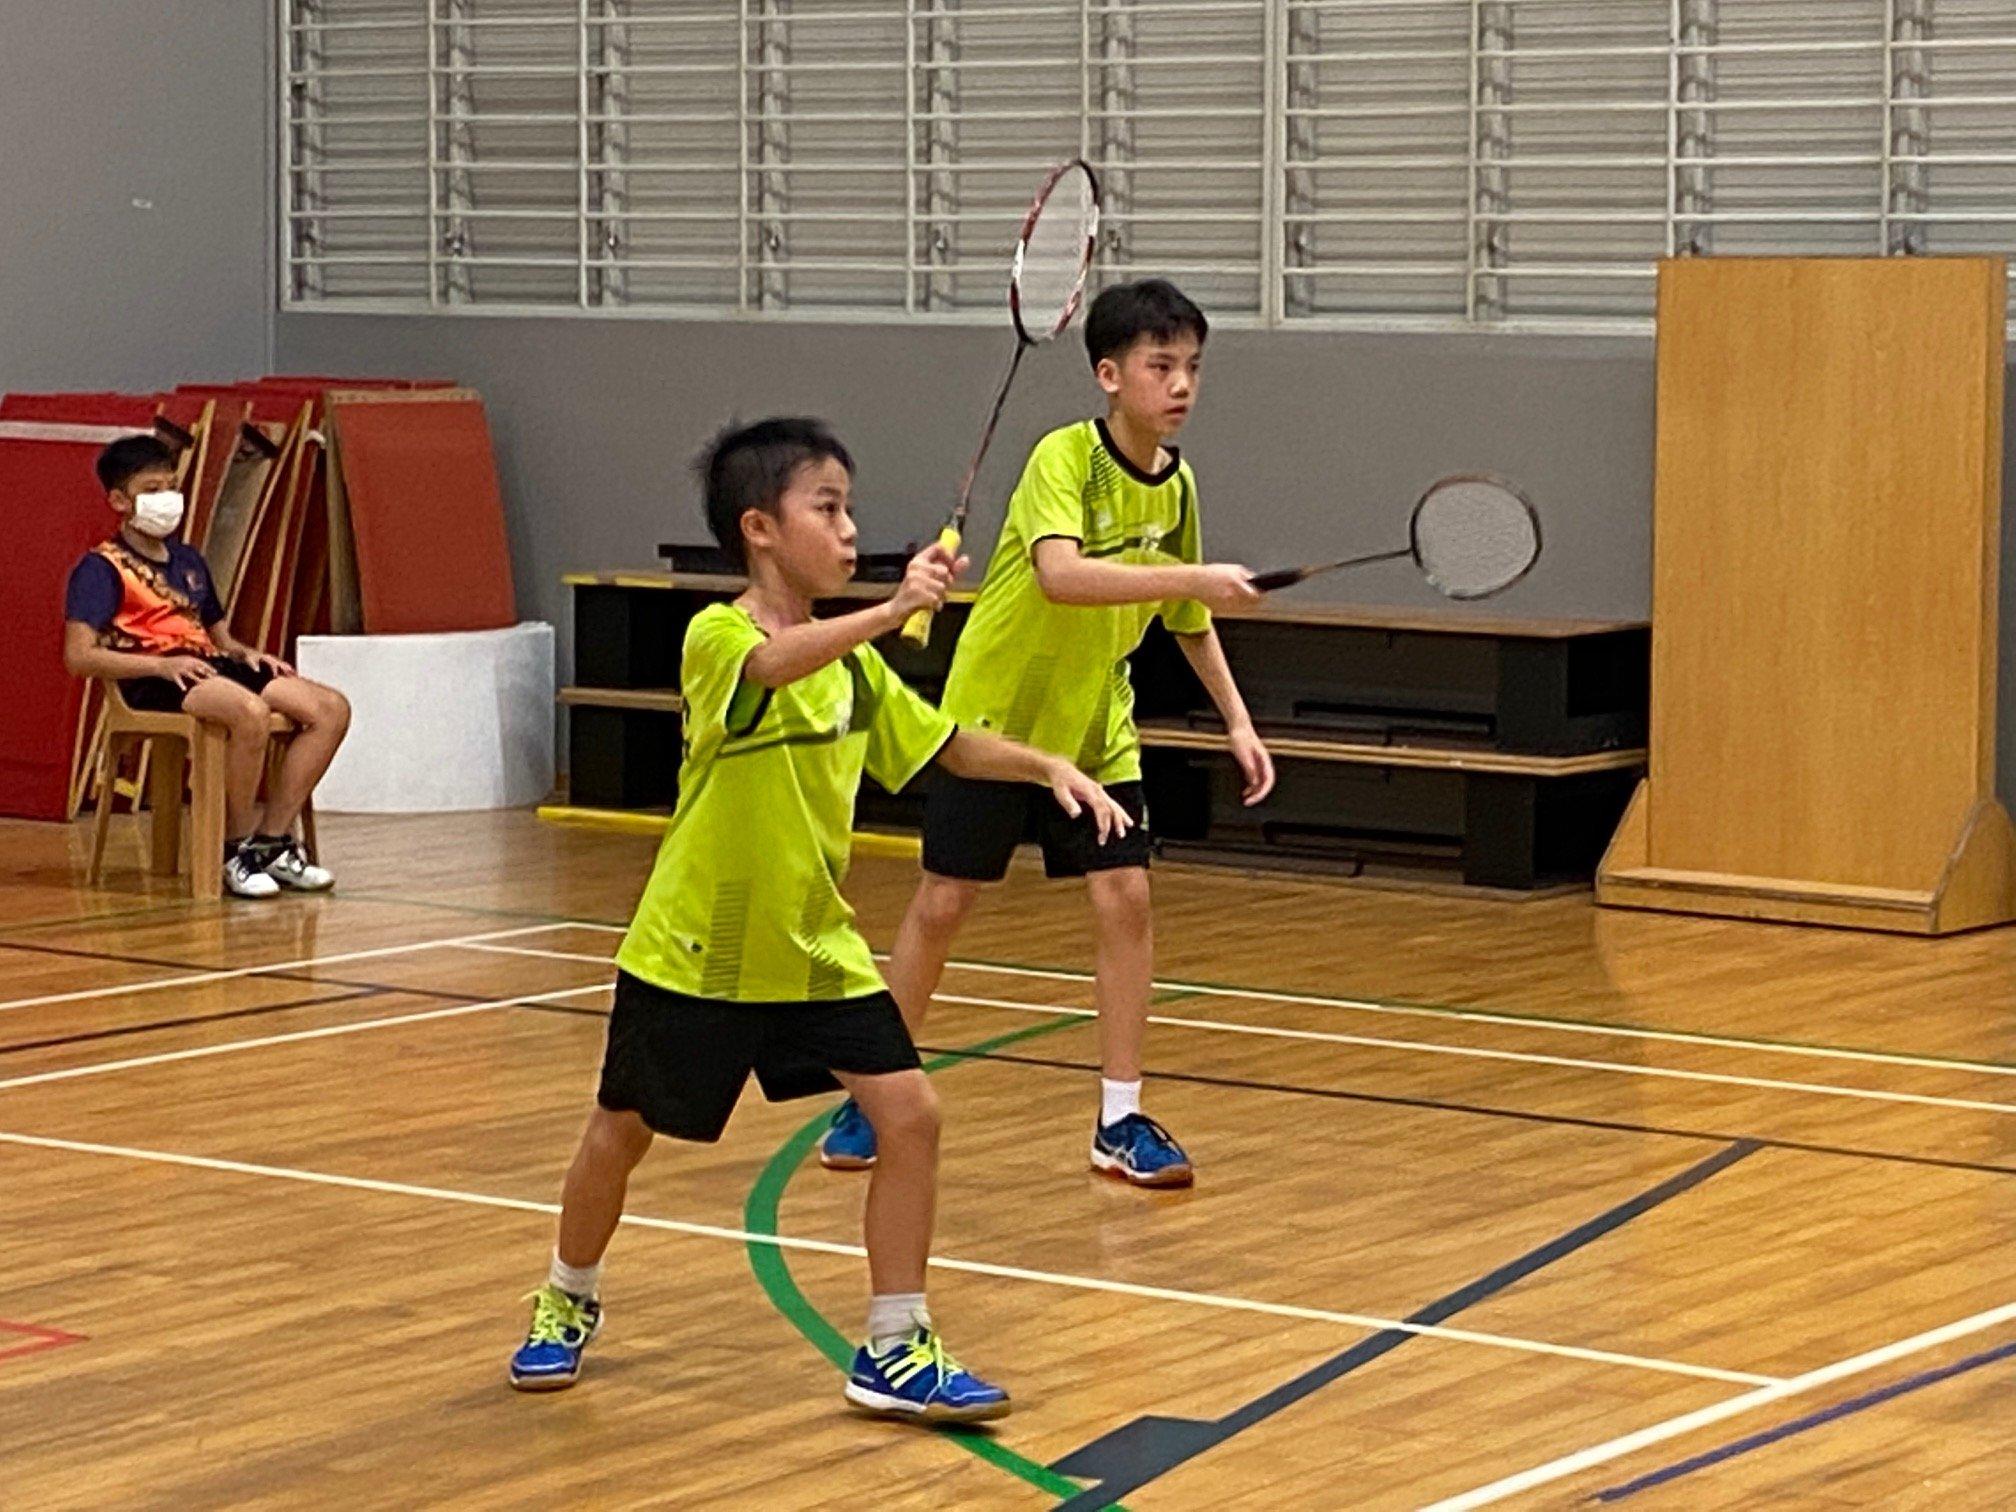 NSG Snr Div South Zone boys' badminton_ SJI Junior first doubles